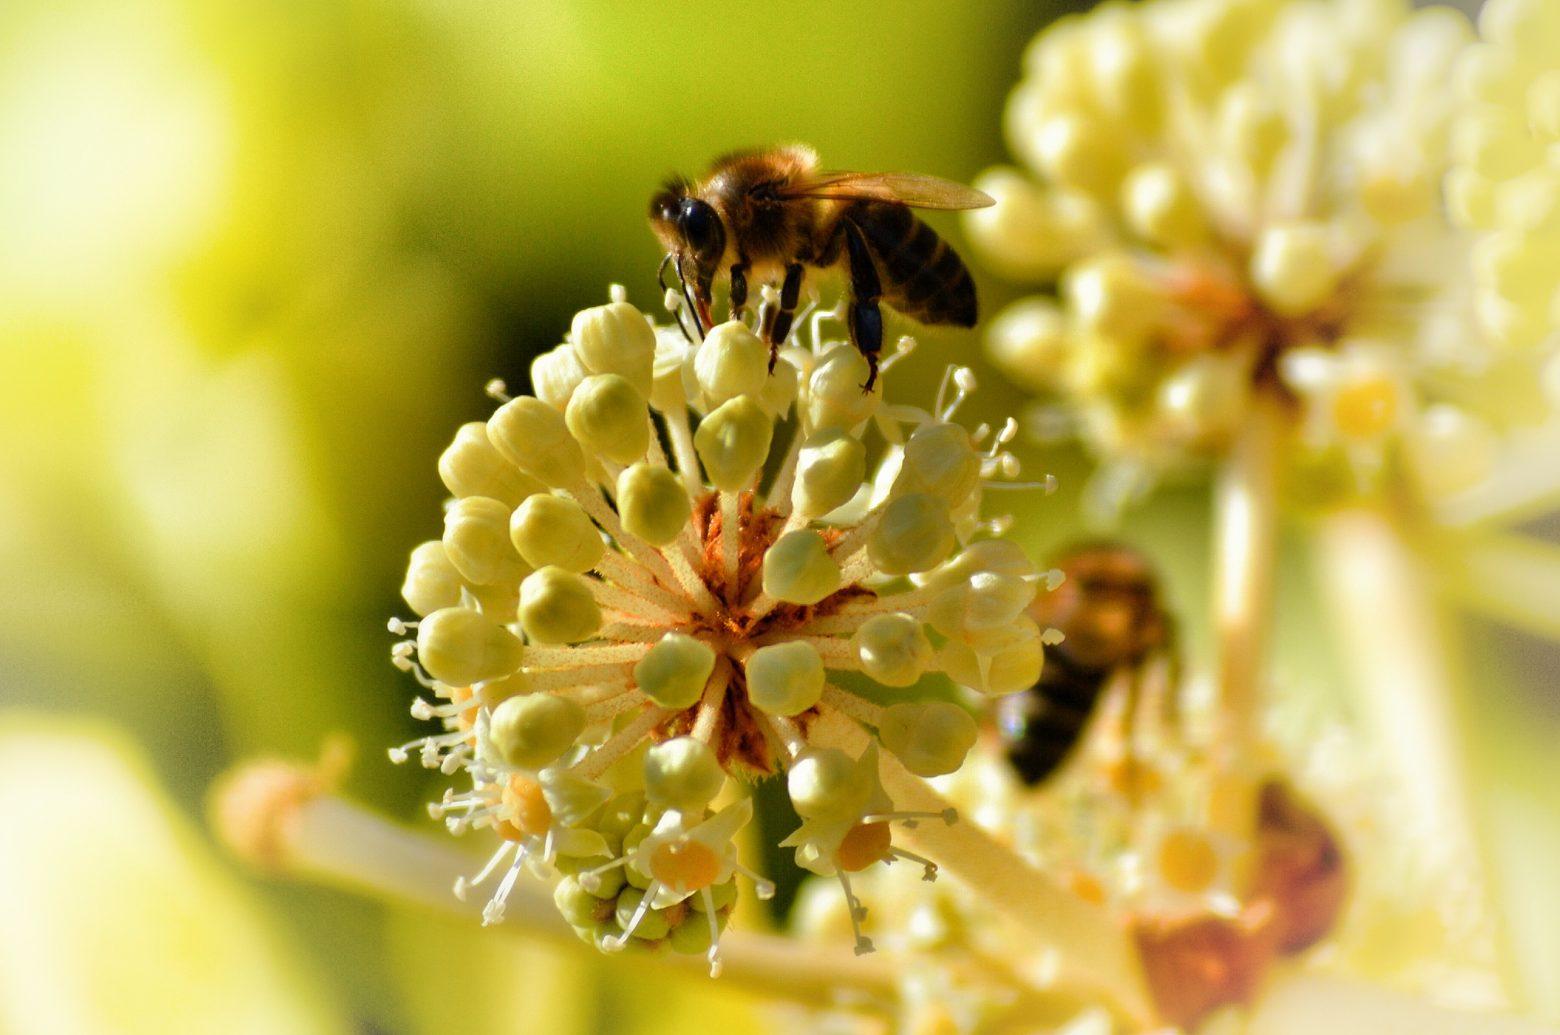 Bee zipping nectar